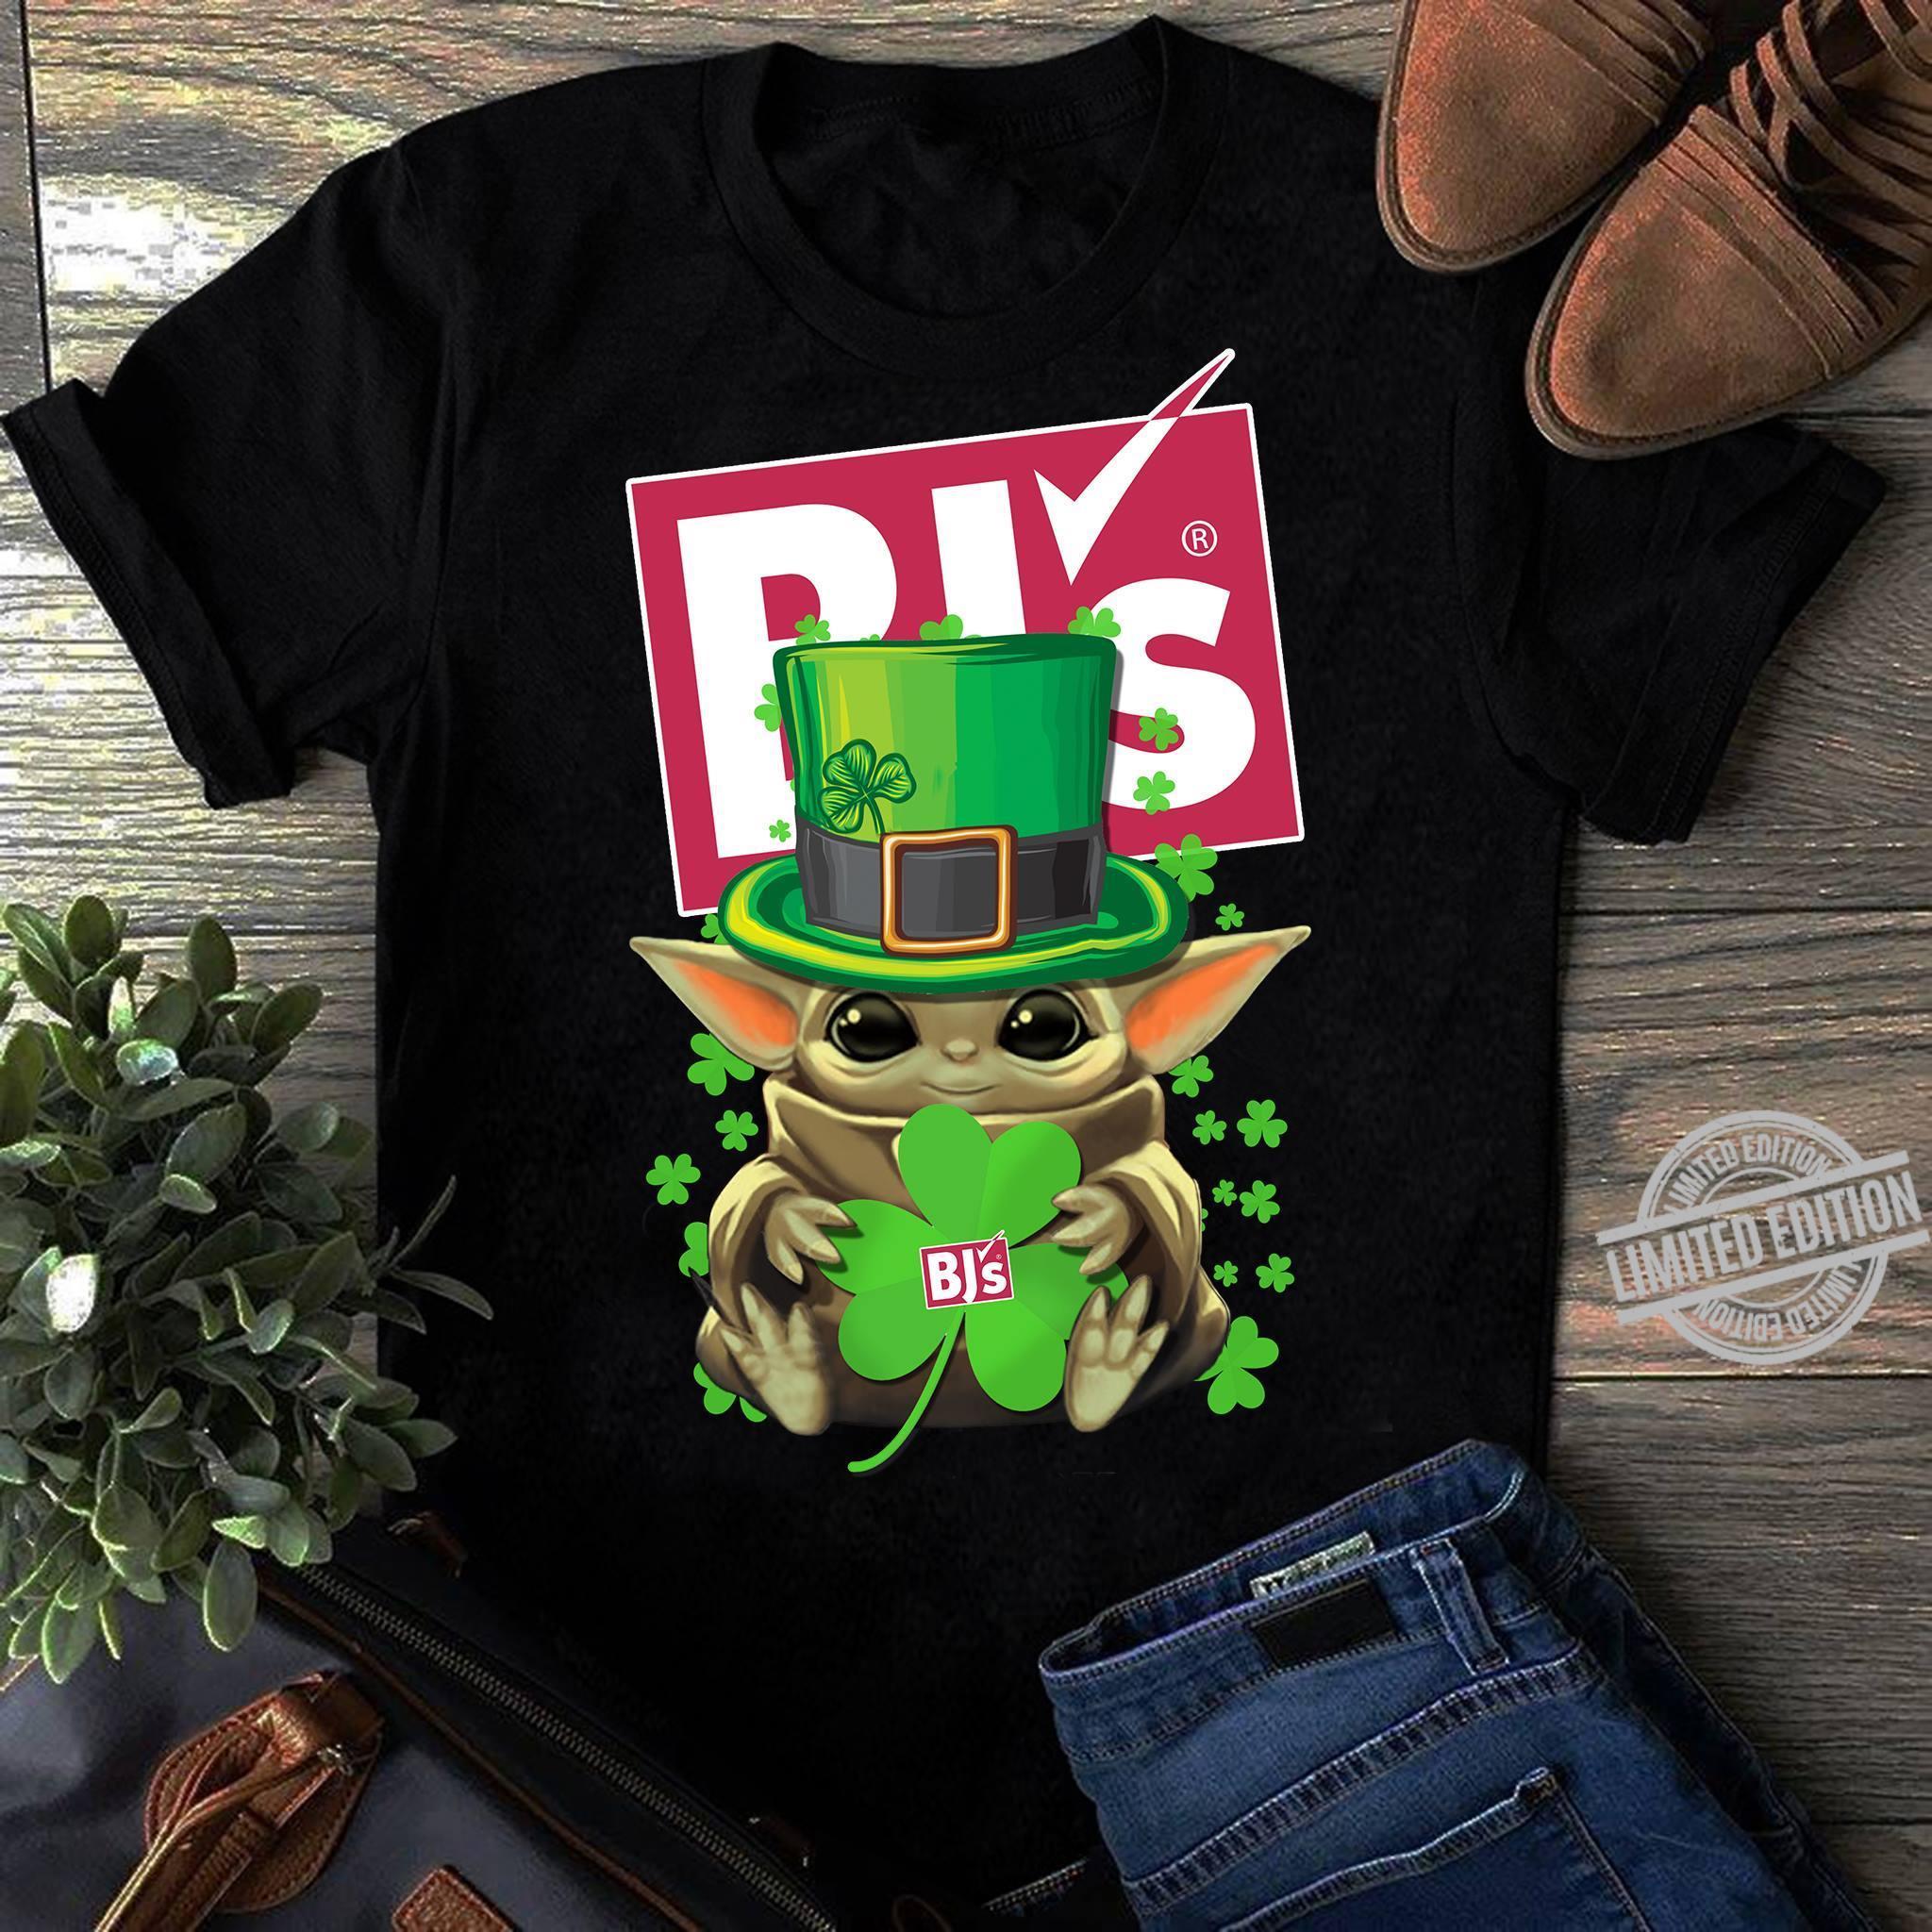 Bjs Yoda Shirt